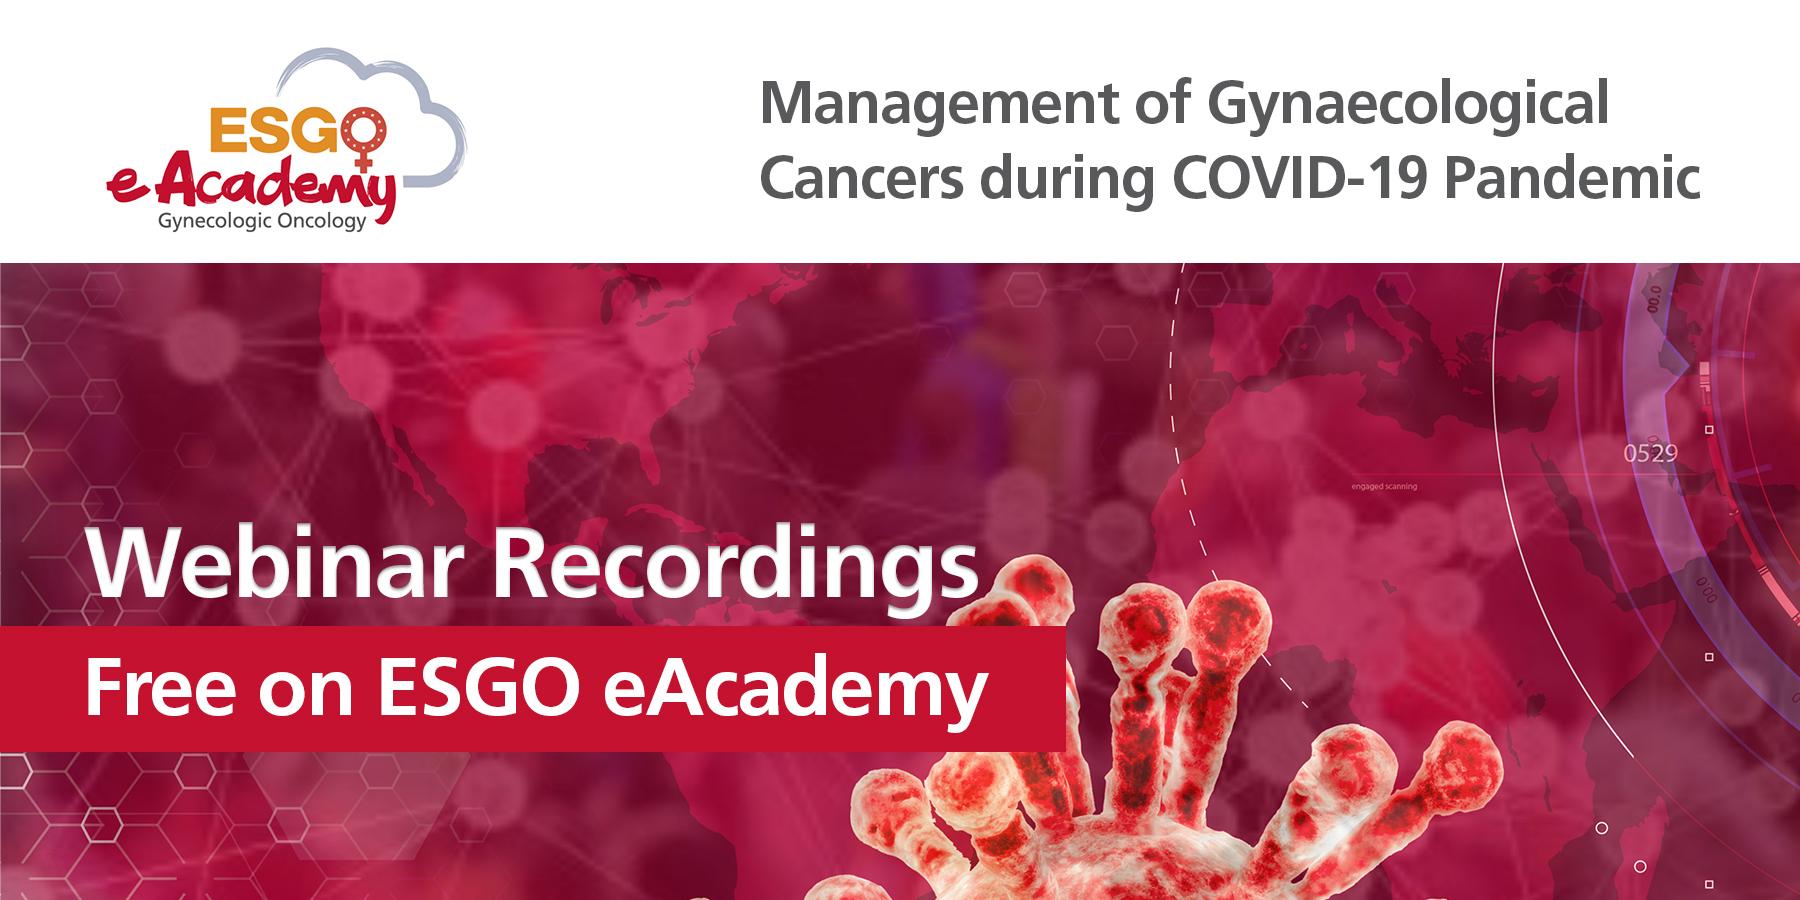 Cocid19_eAcademy-recordings